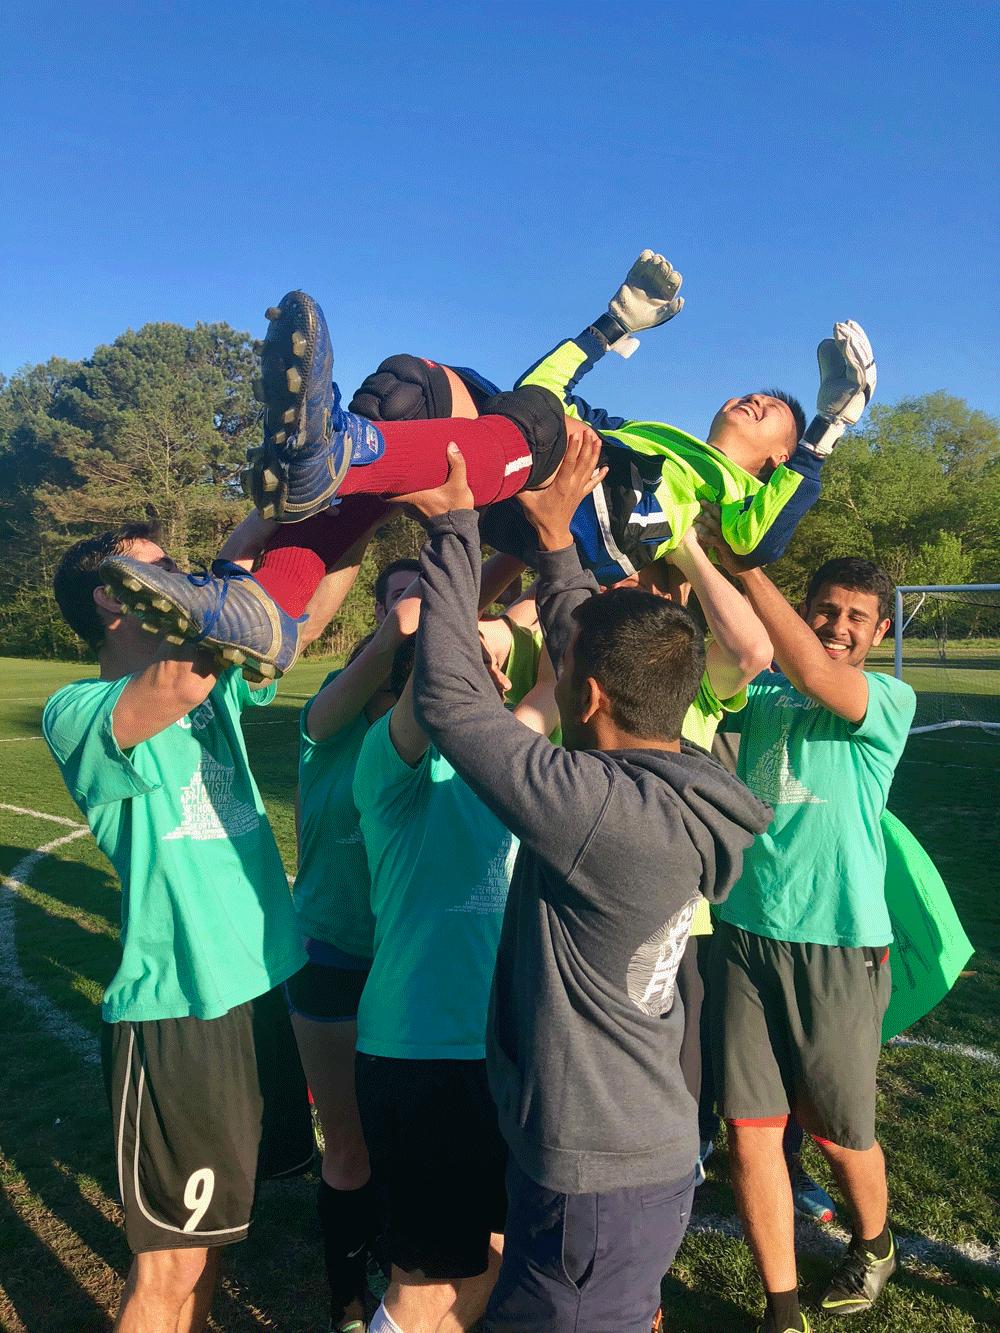 winning celebration